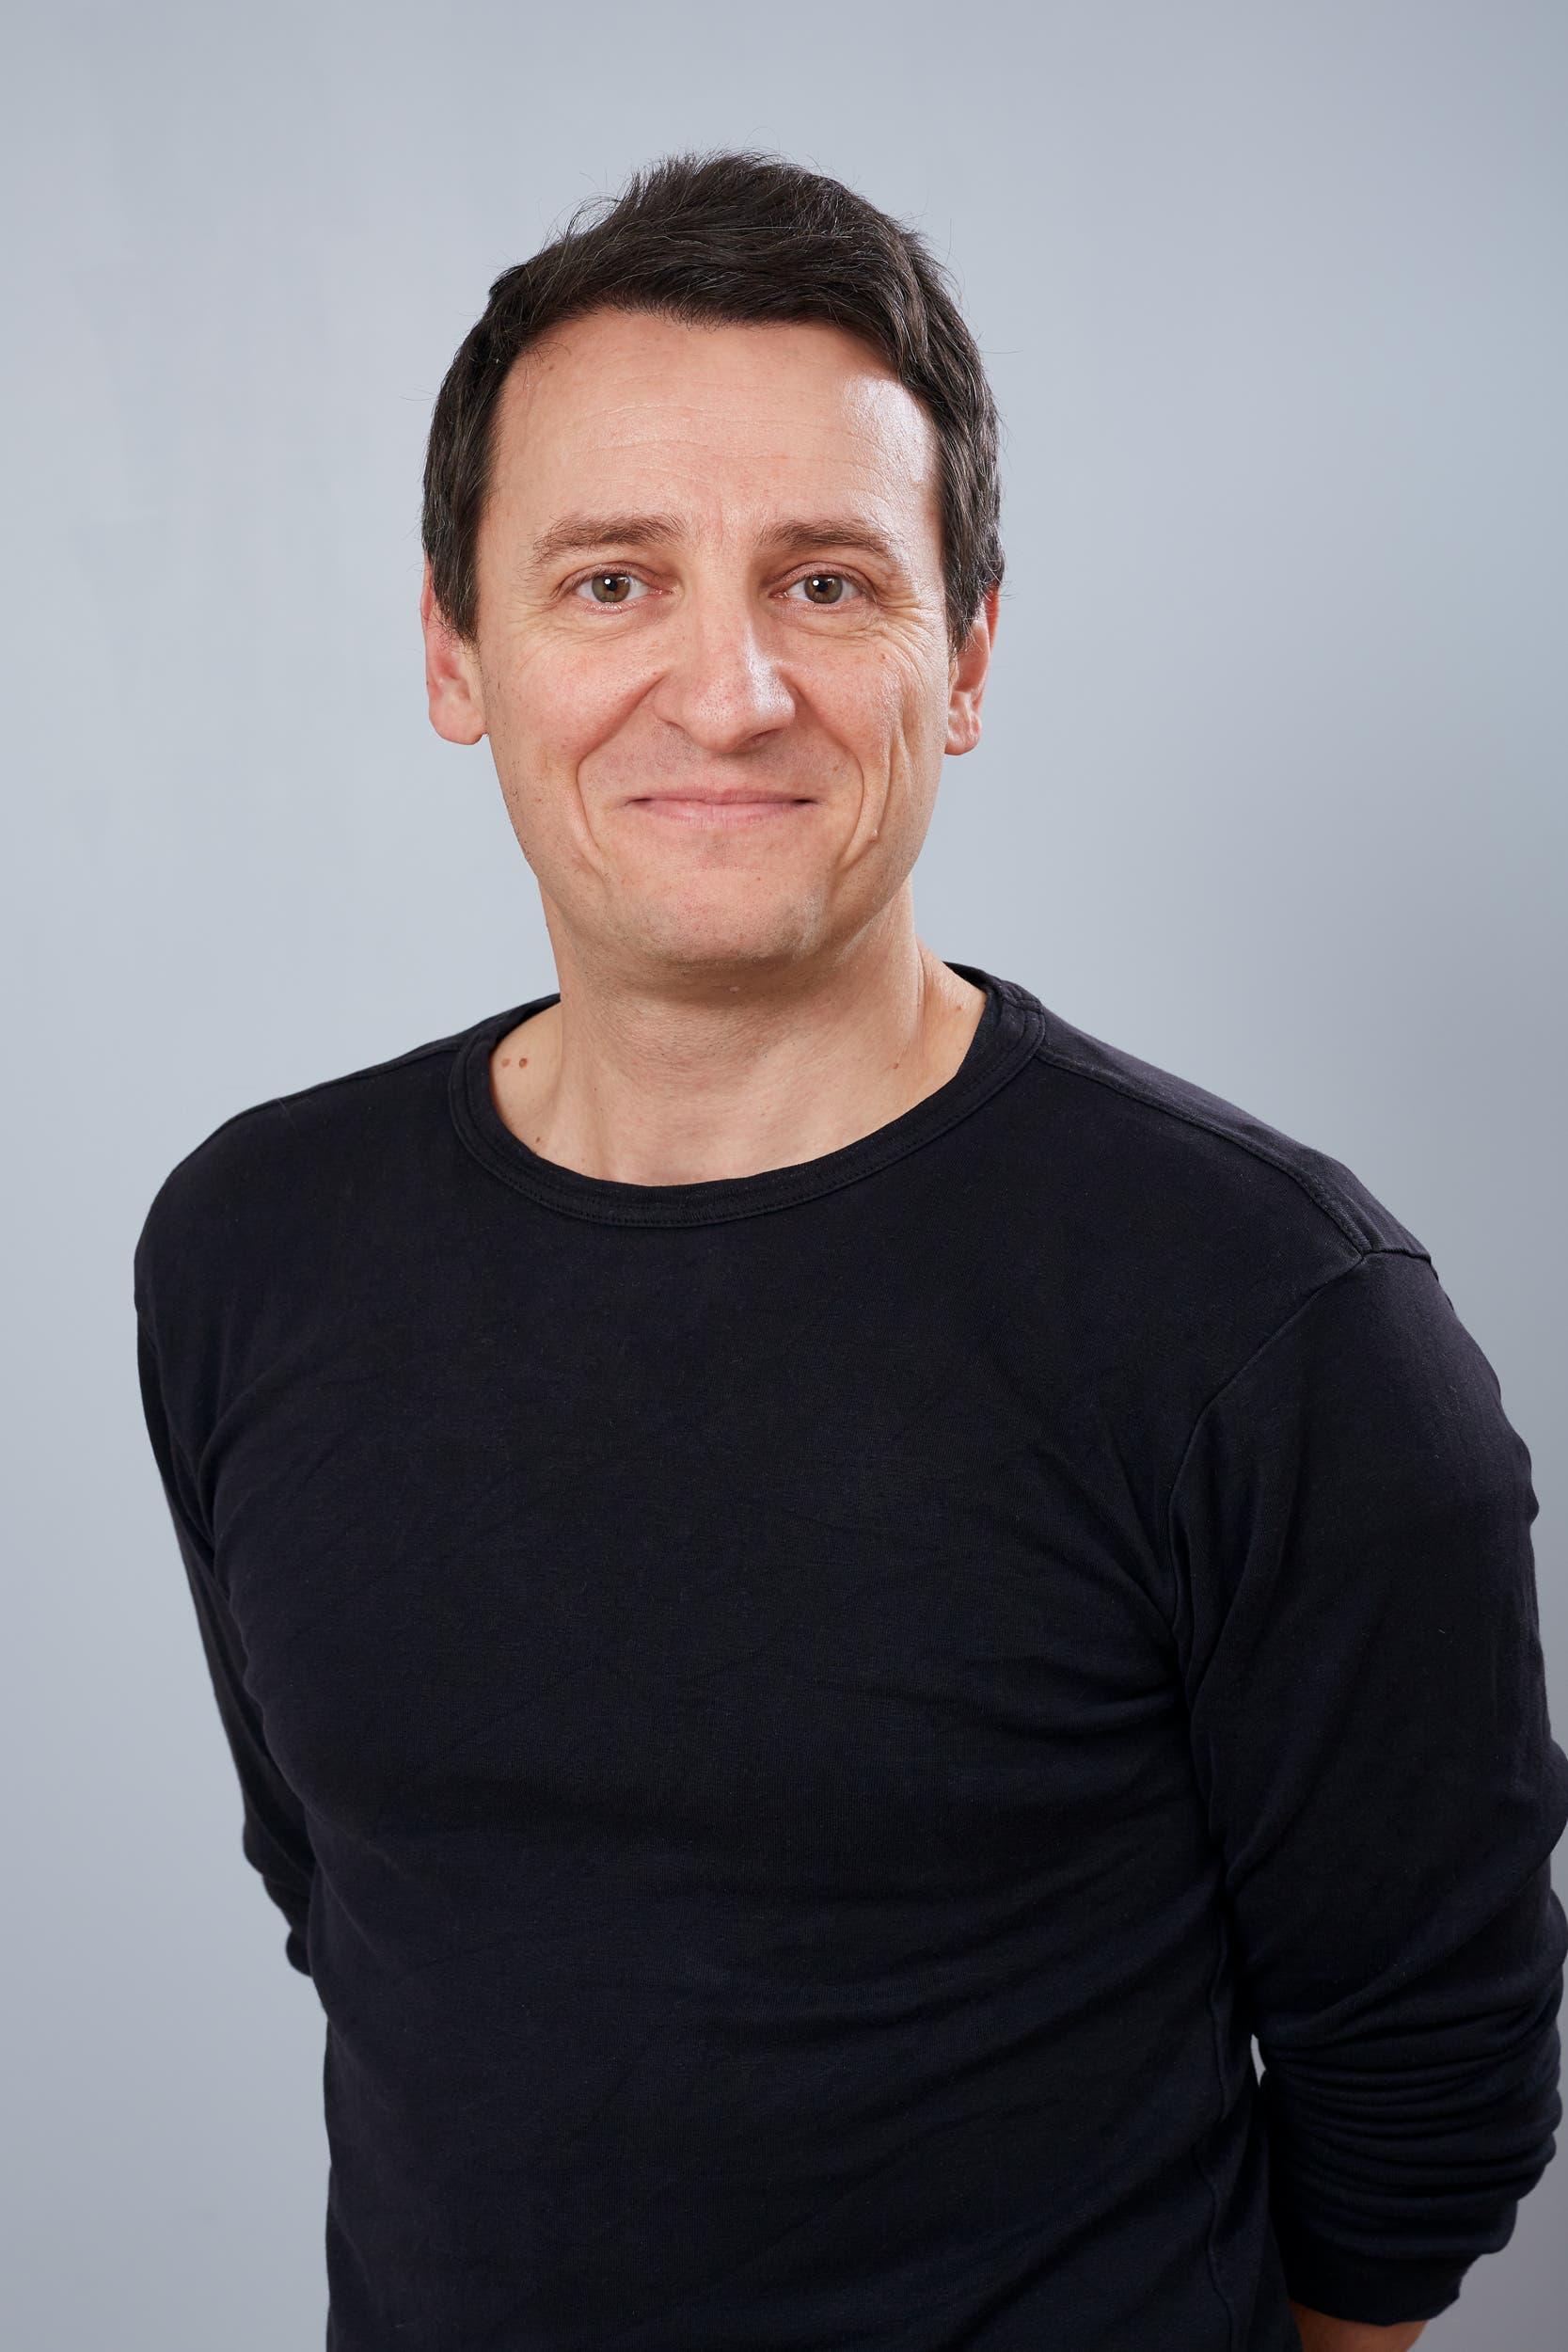 Adrian Albisser, SP (bisher)